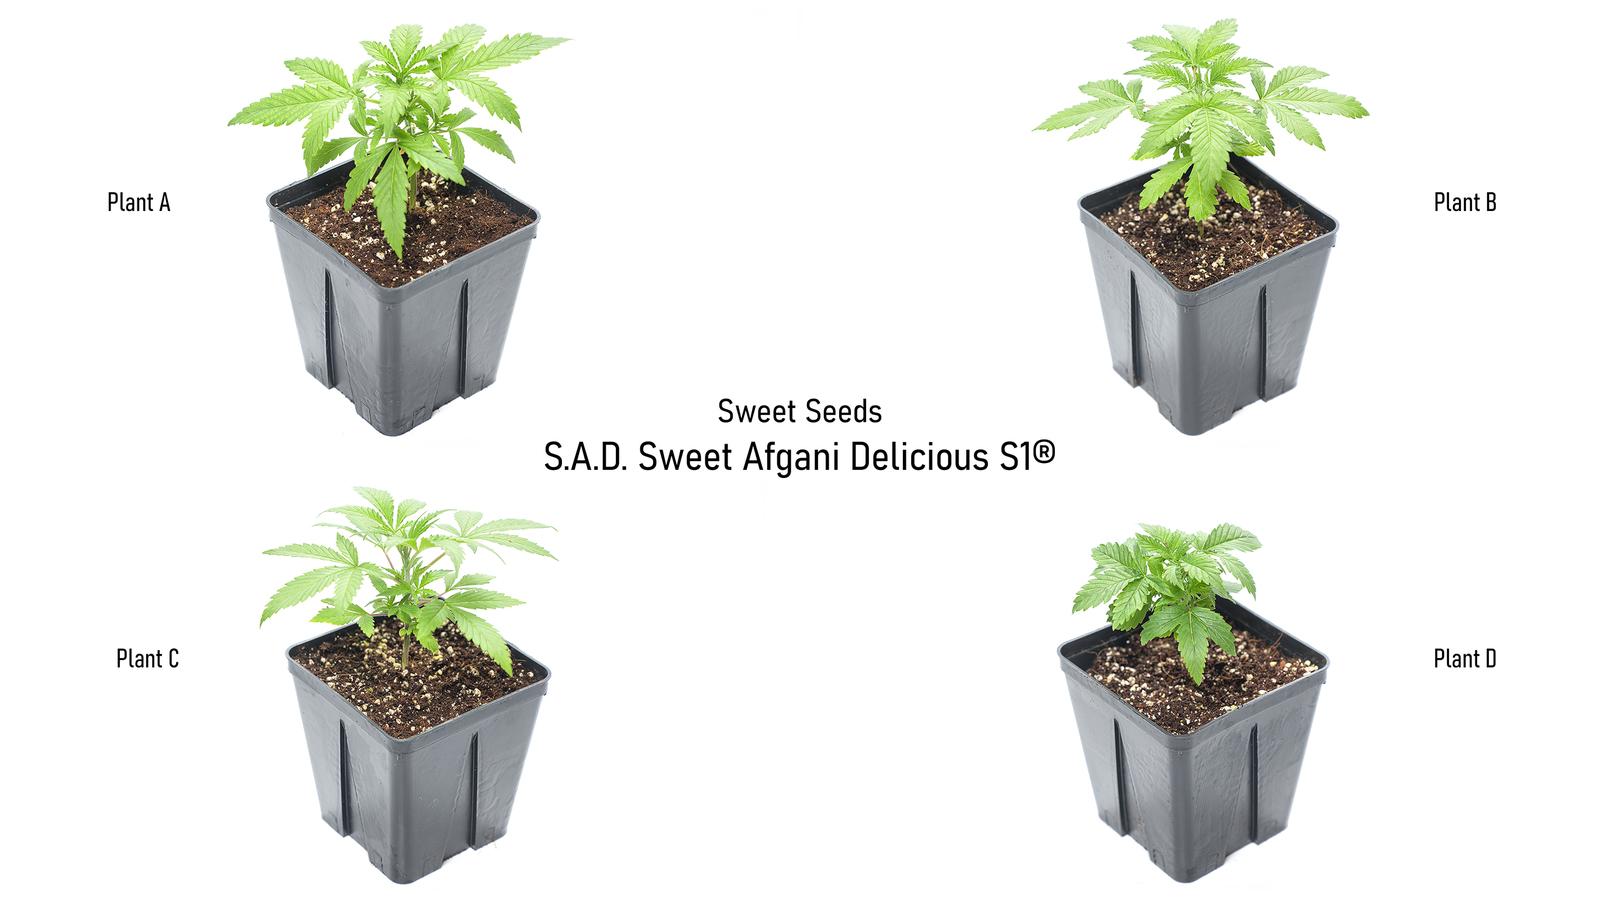 large.5fb94fa8e0195_SweetSeeds-SweetAfganiDeliciousS1-FourPlants21-11-2020.jpg